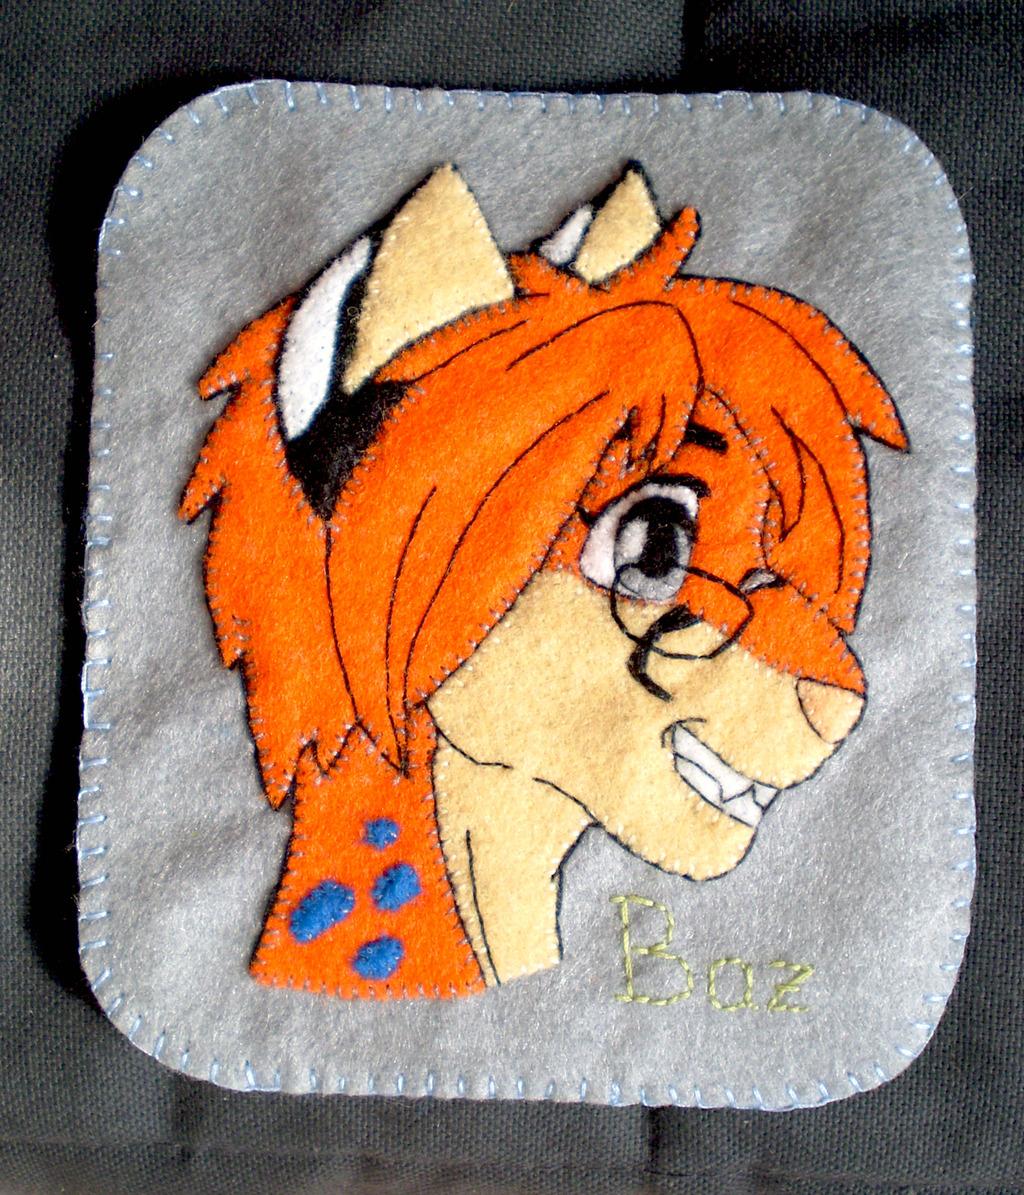 Baz craft badge